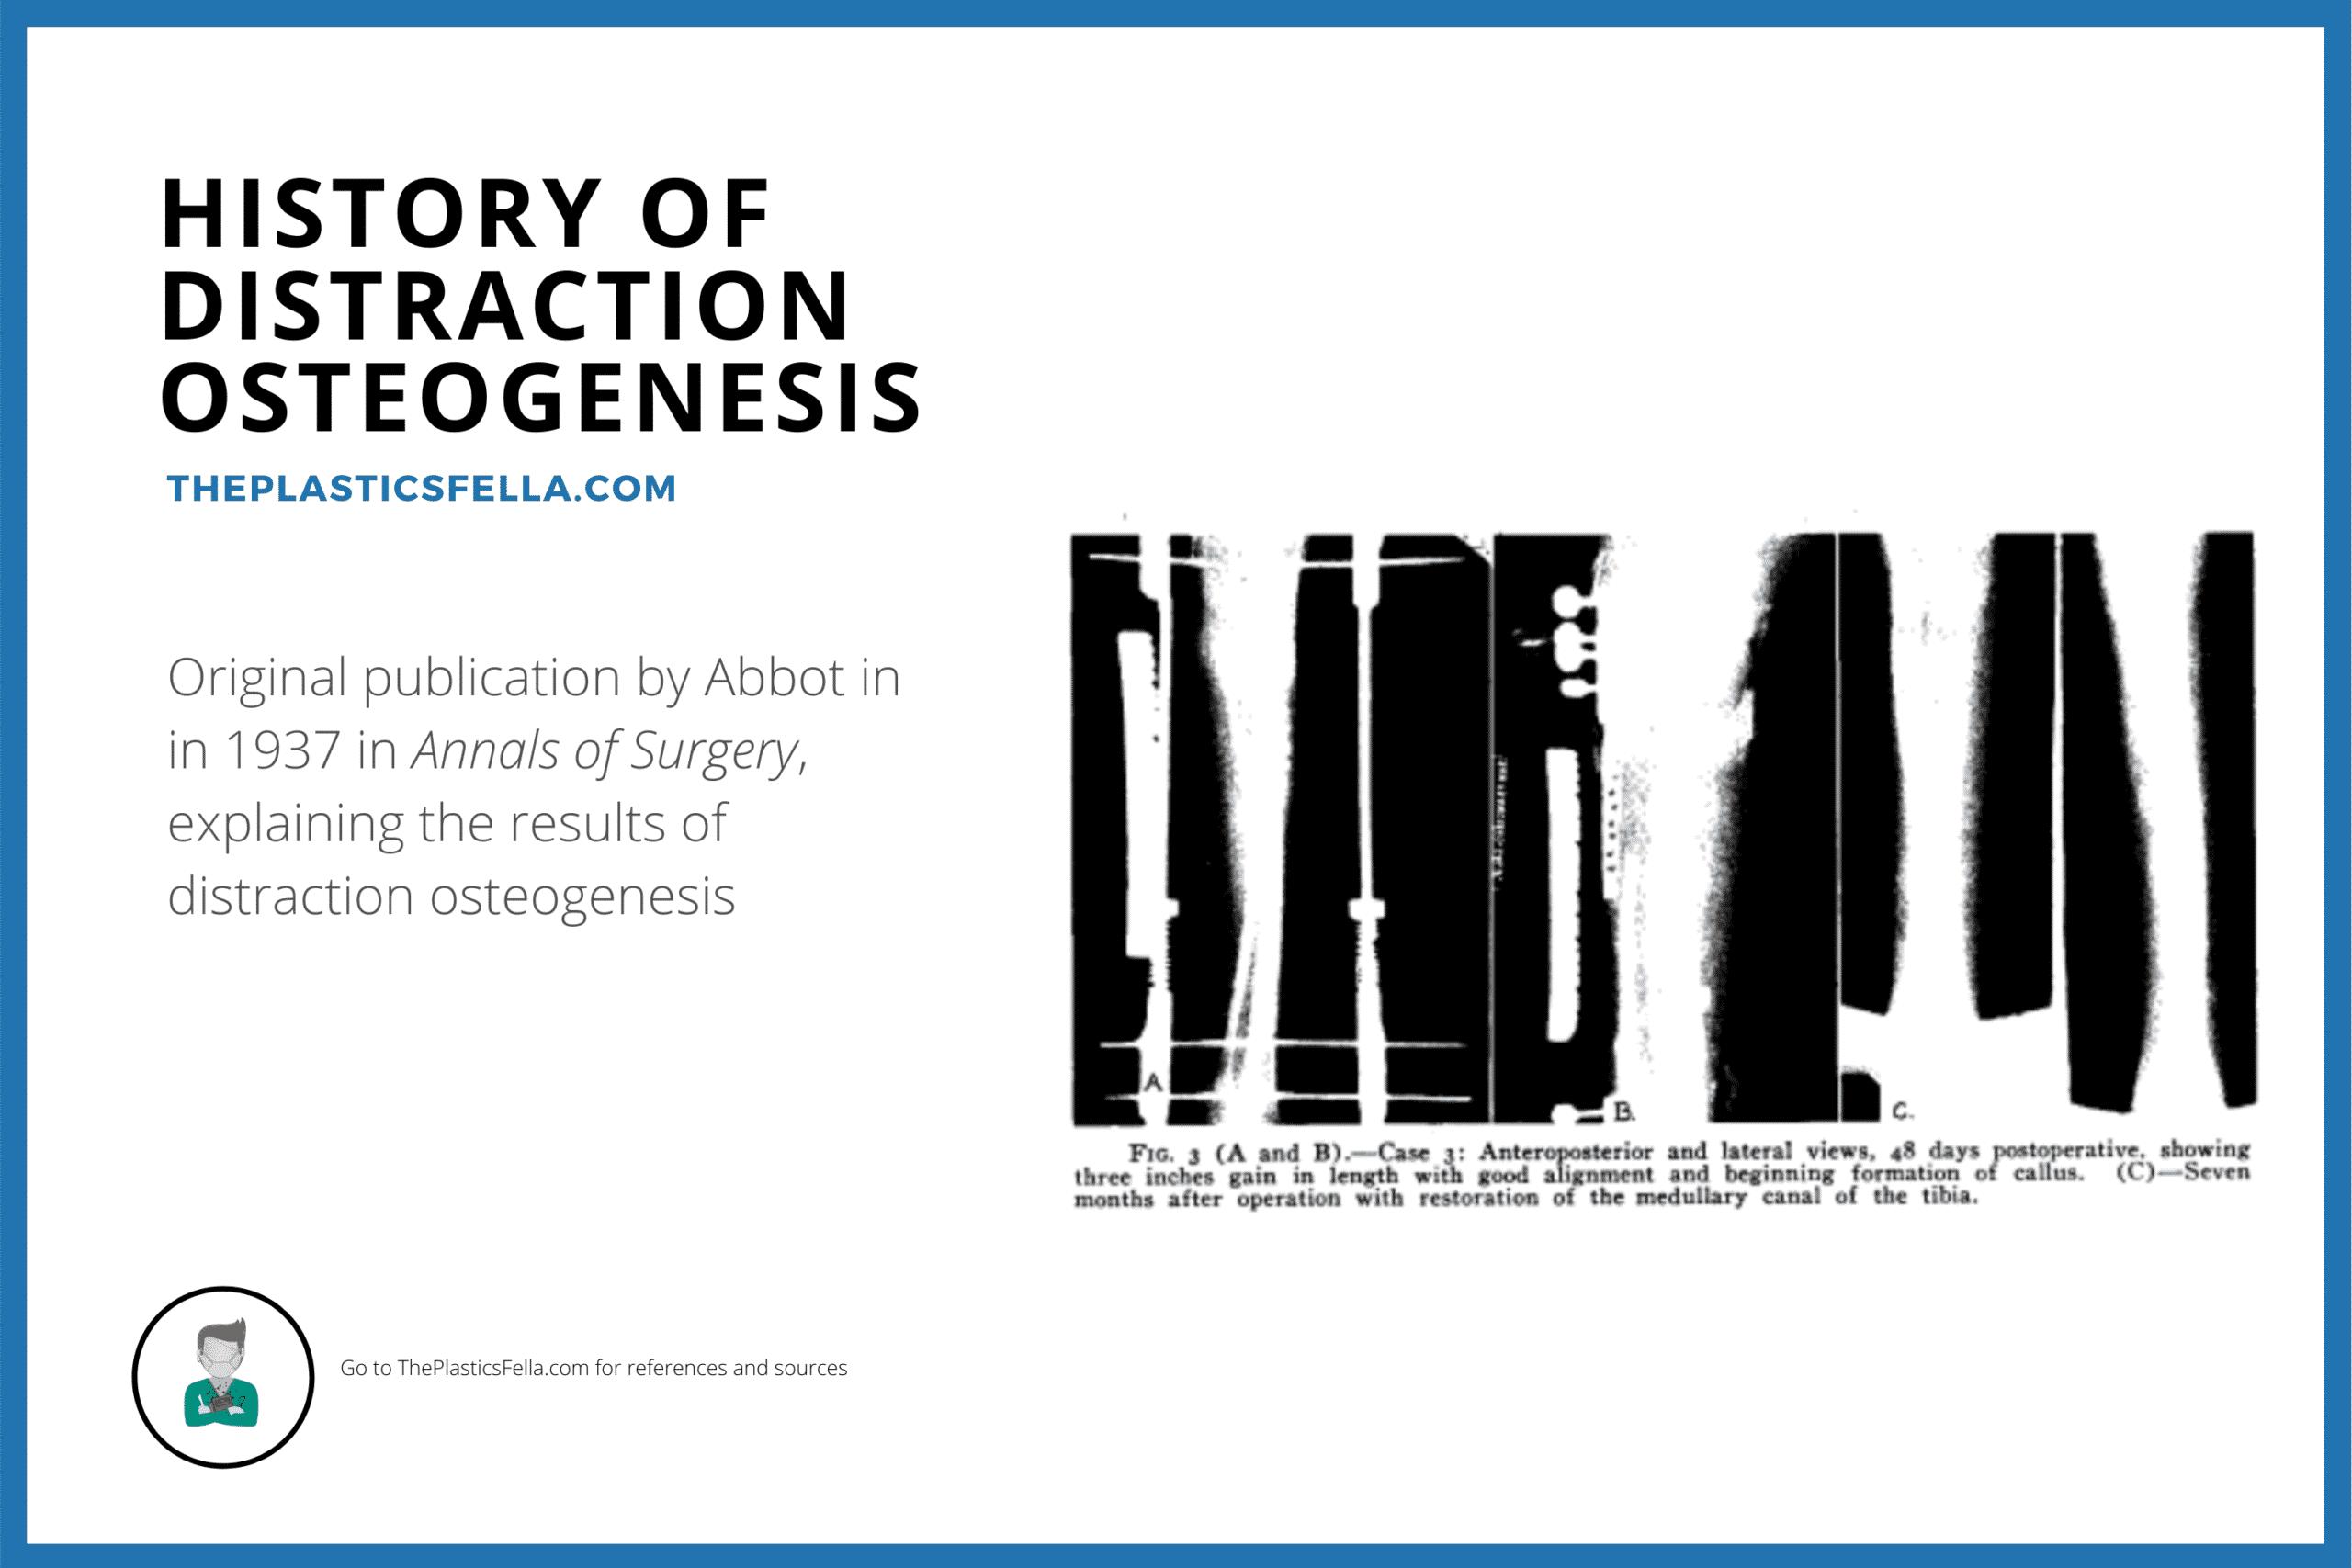 History of Distraction Osteogenesis, Ilizarov, Craniofacial